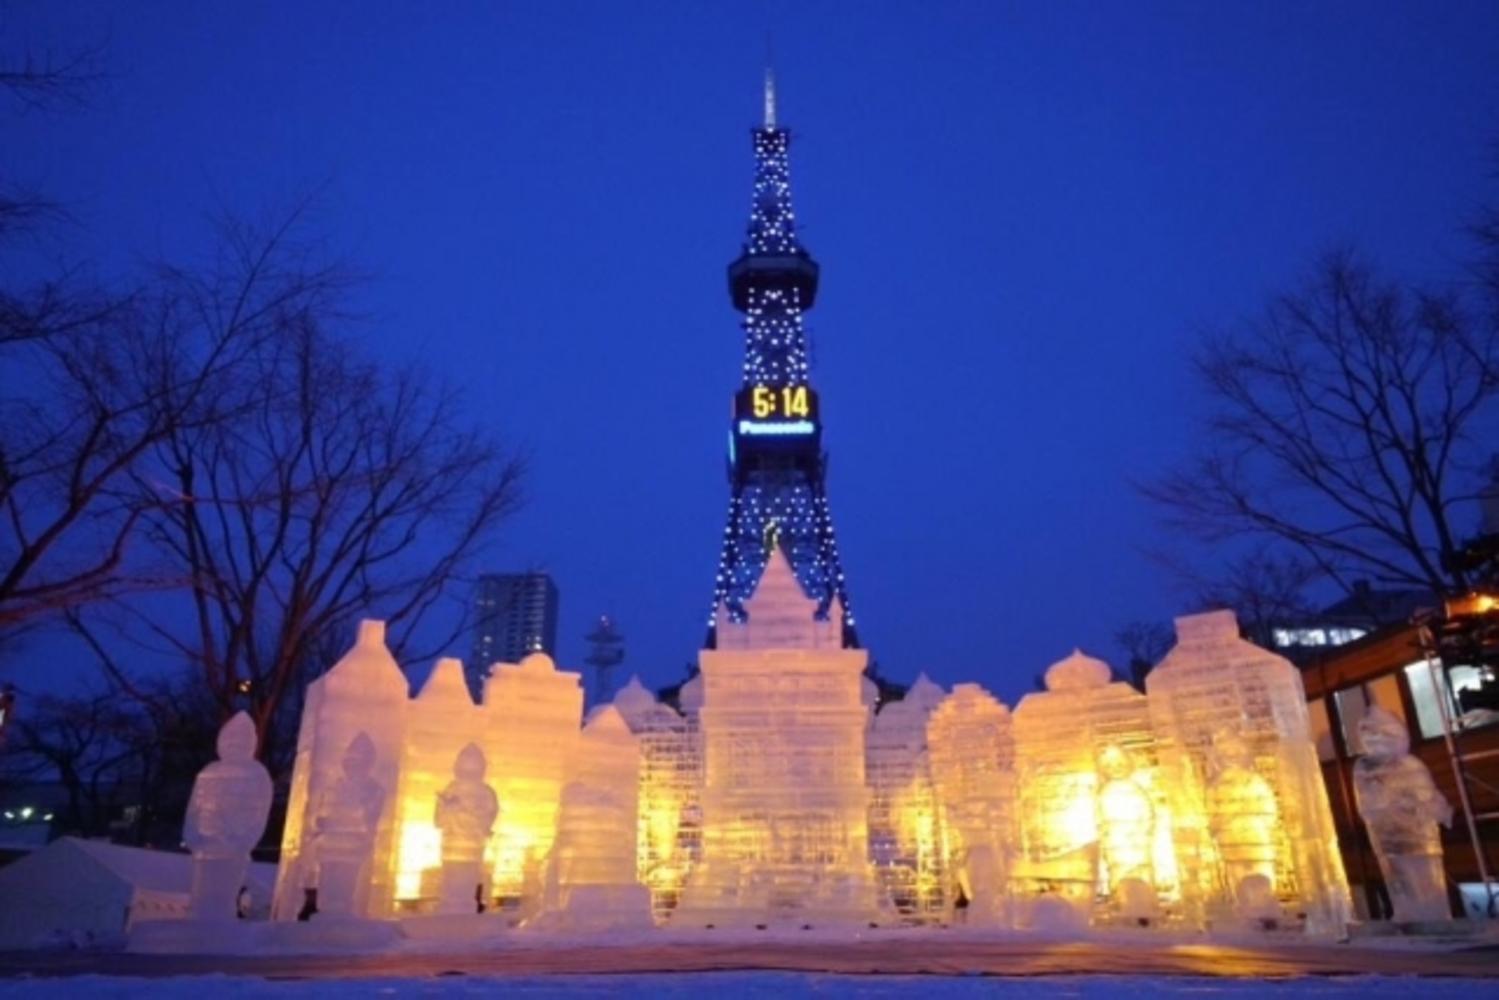 Sapporo Snow Festival札幌雪まつり: Sapporo Yuki Matsuri